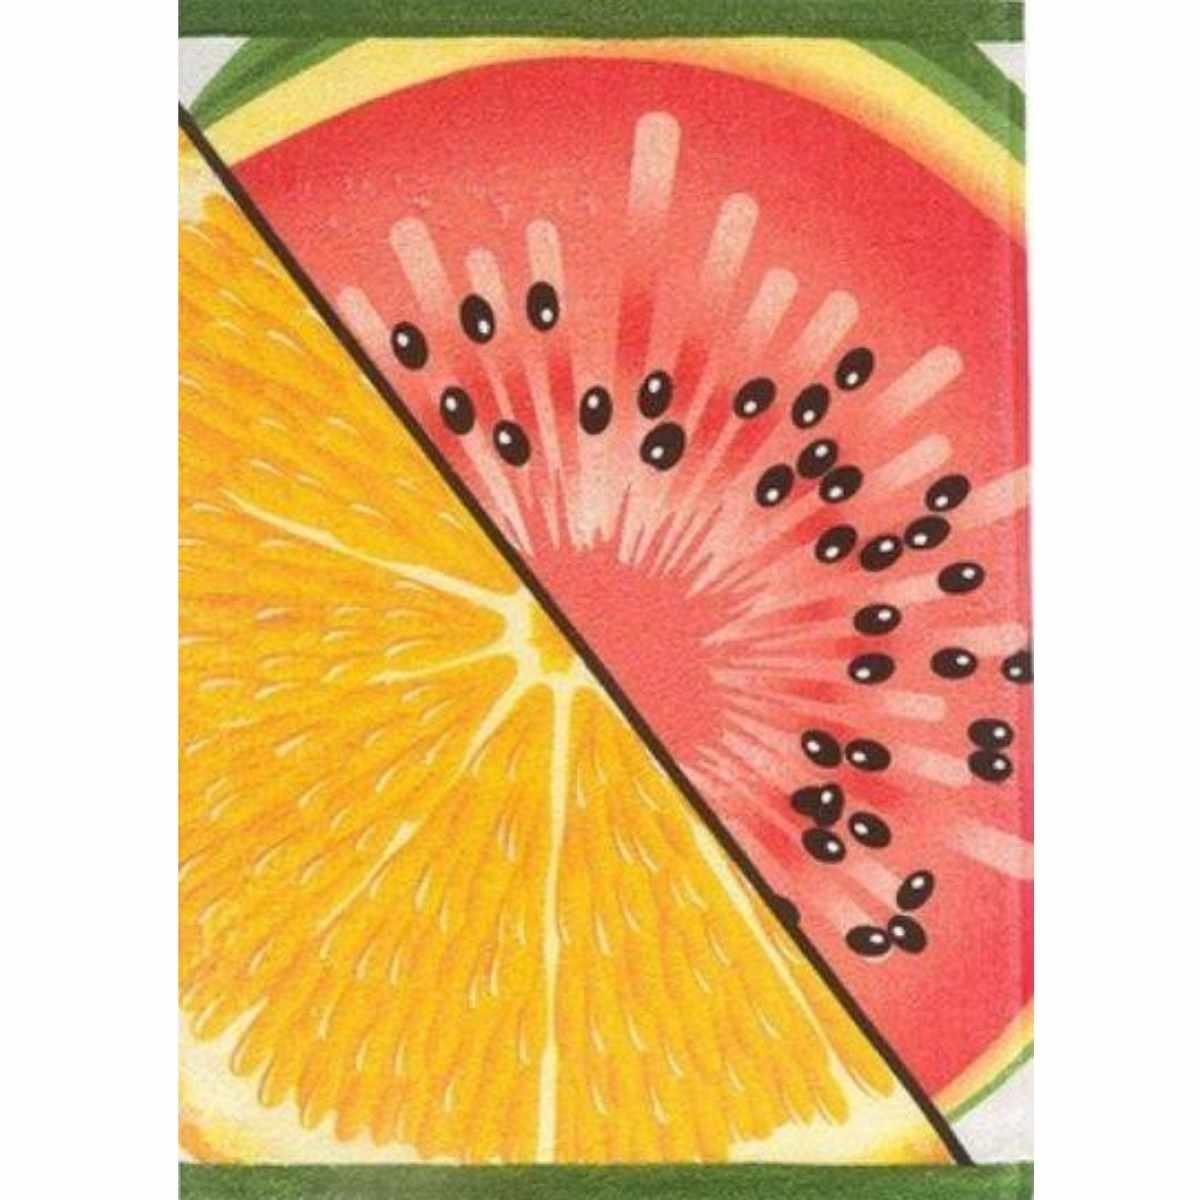 Pano de Copa Fiori  Fruit Mix 3